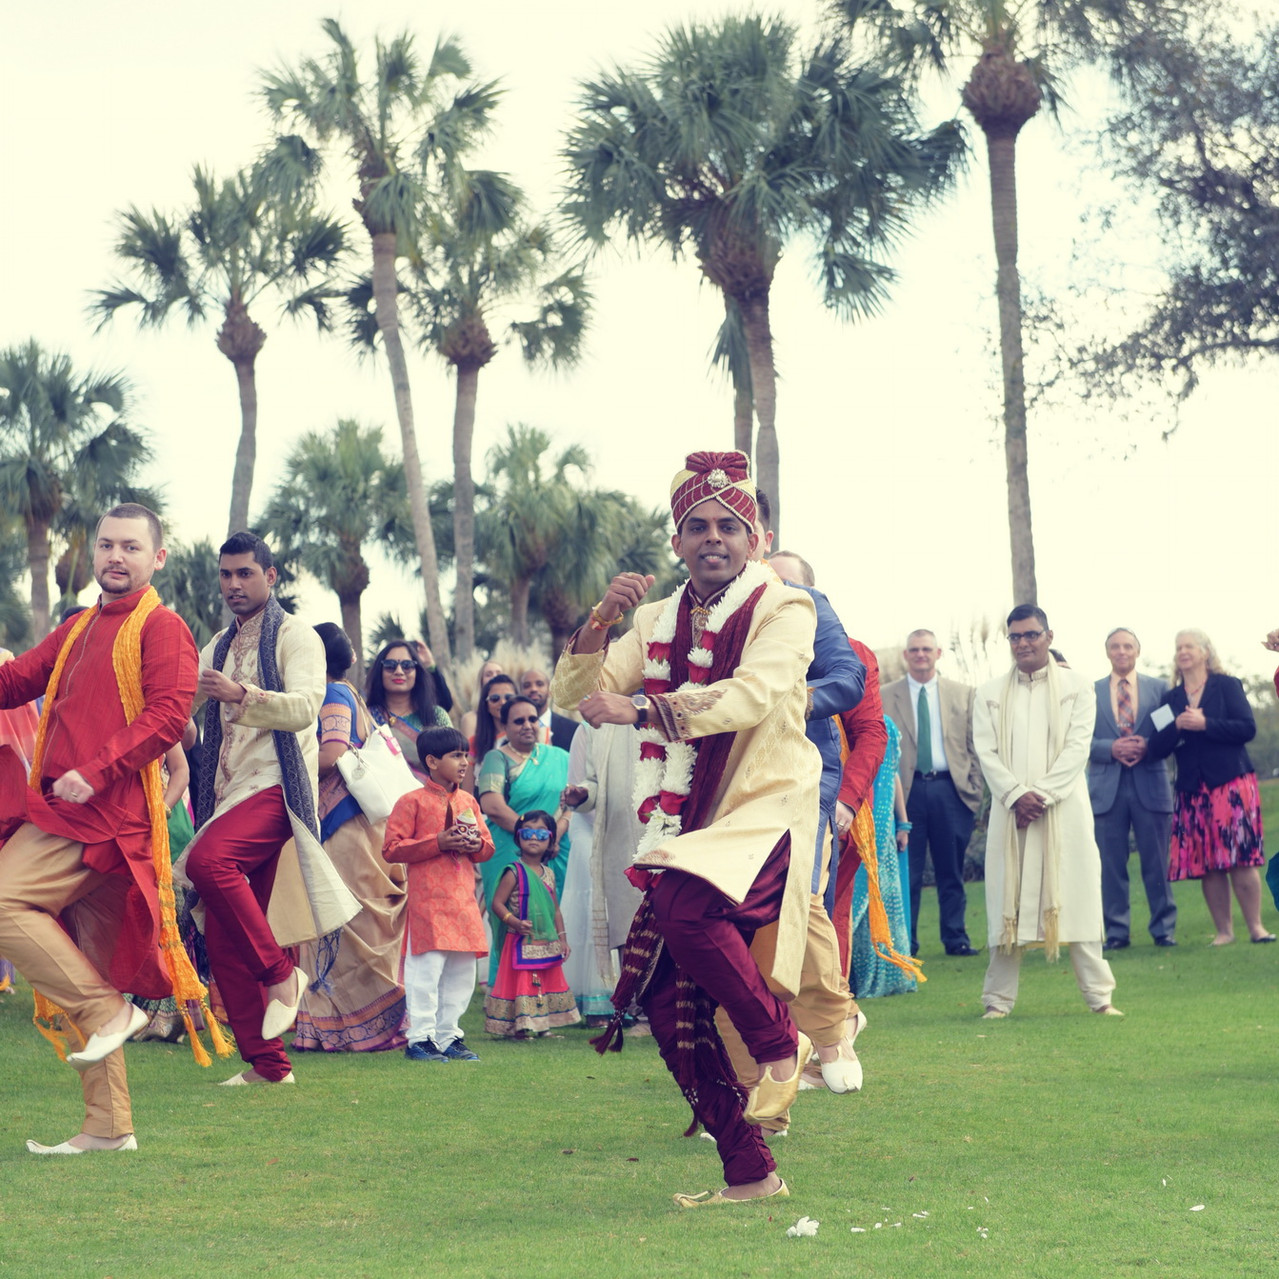 Hyatt-Regency-Grand-Cypress-Indian-Wedding-Photography-Fine-Art-Production-Amish-Thakkar_46